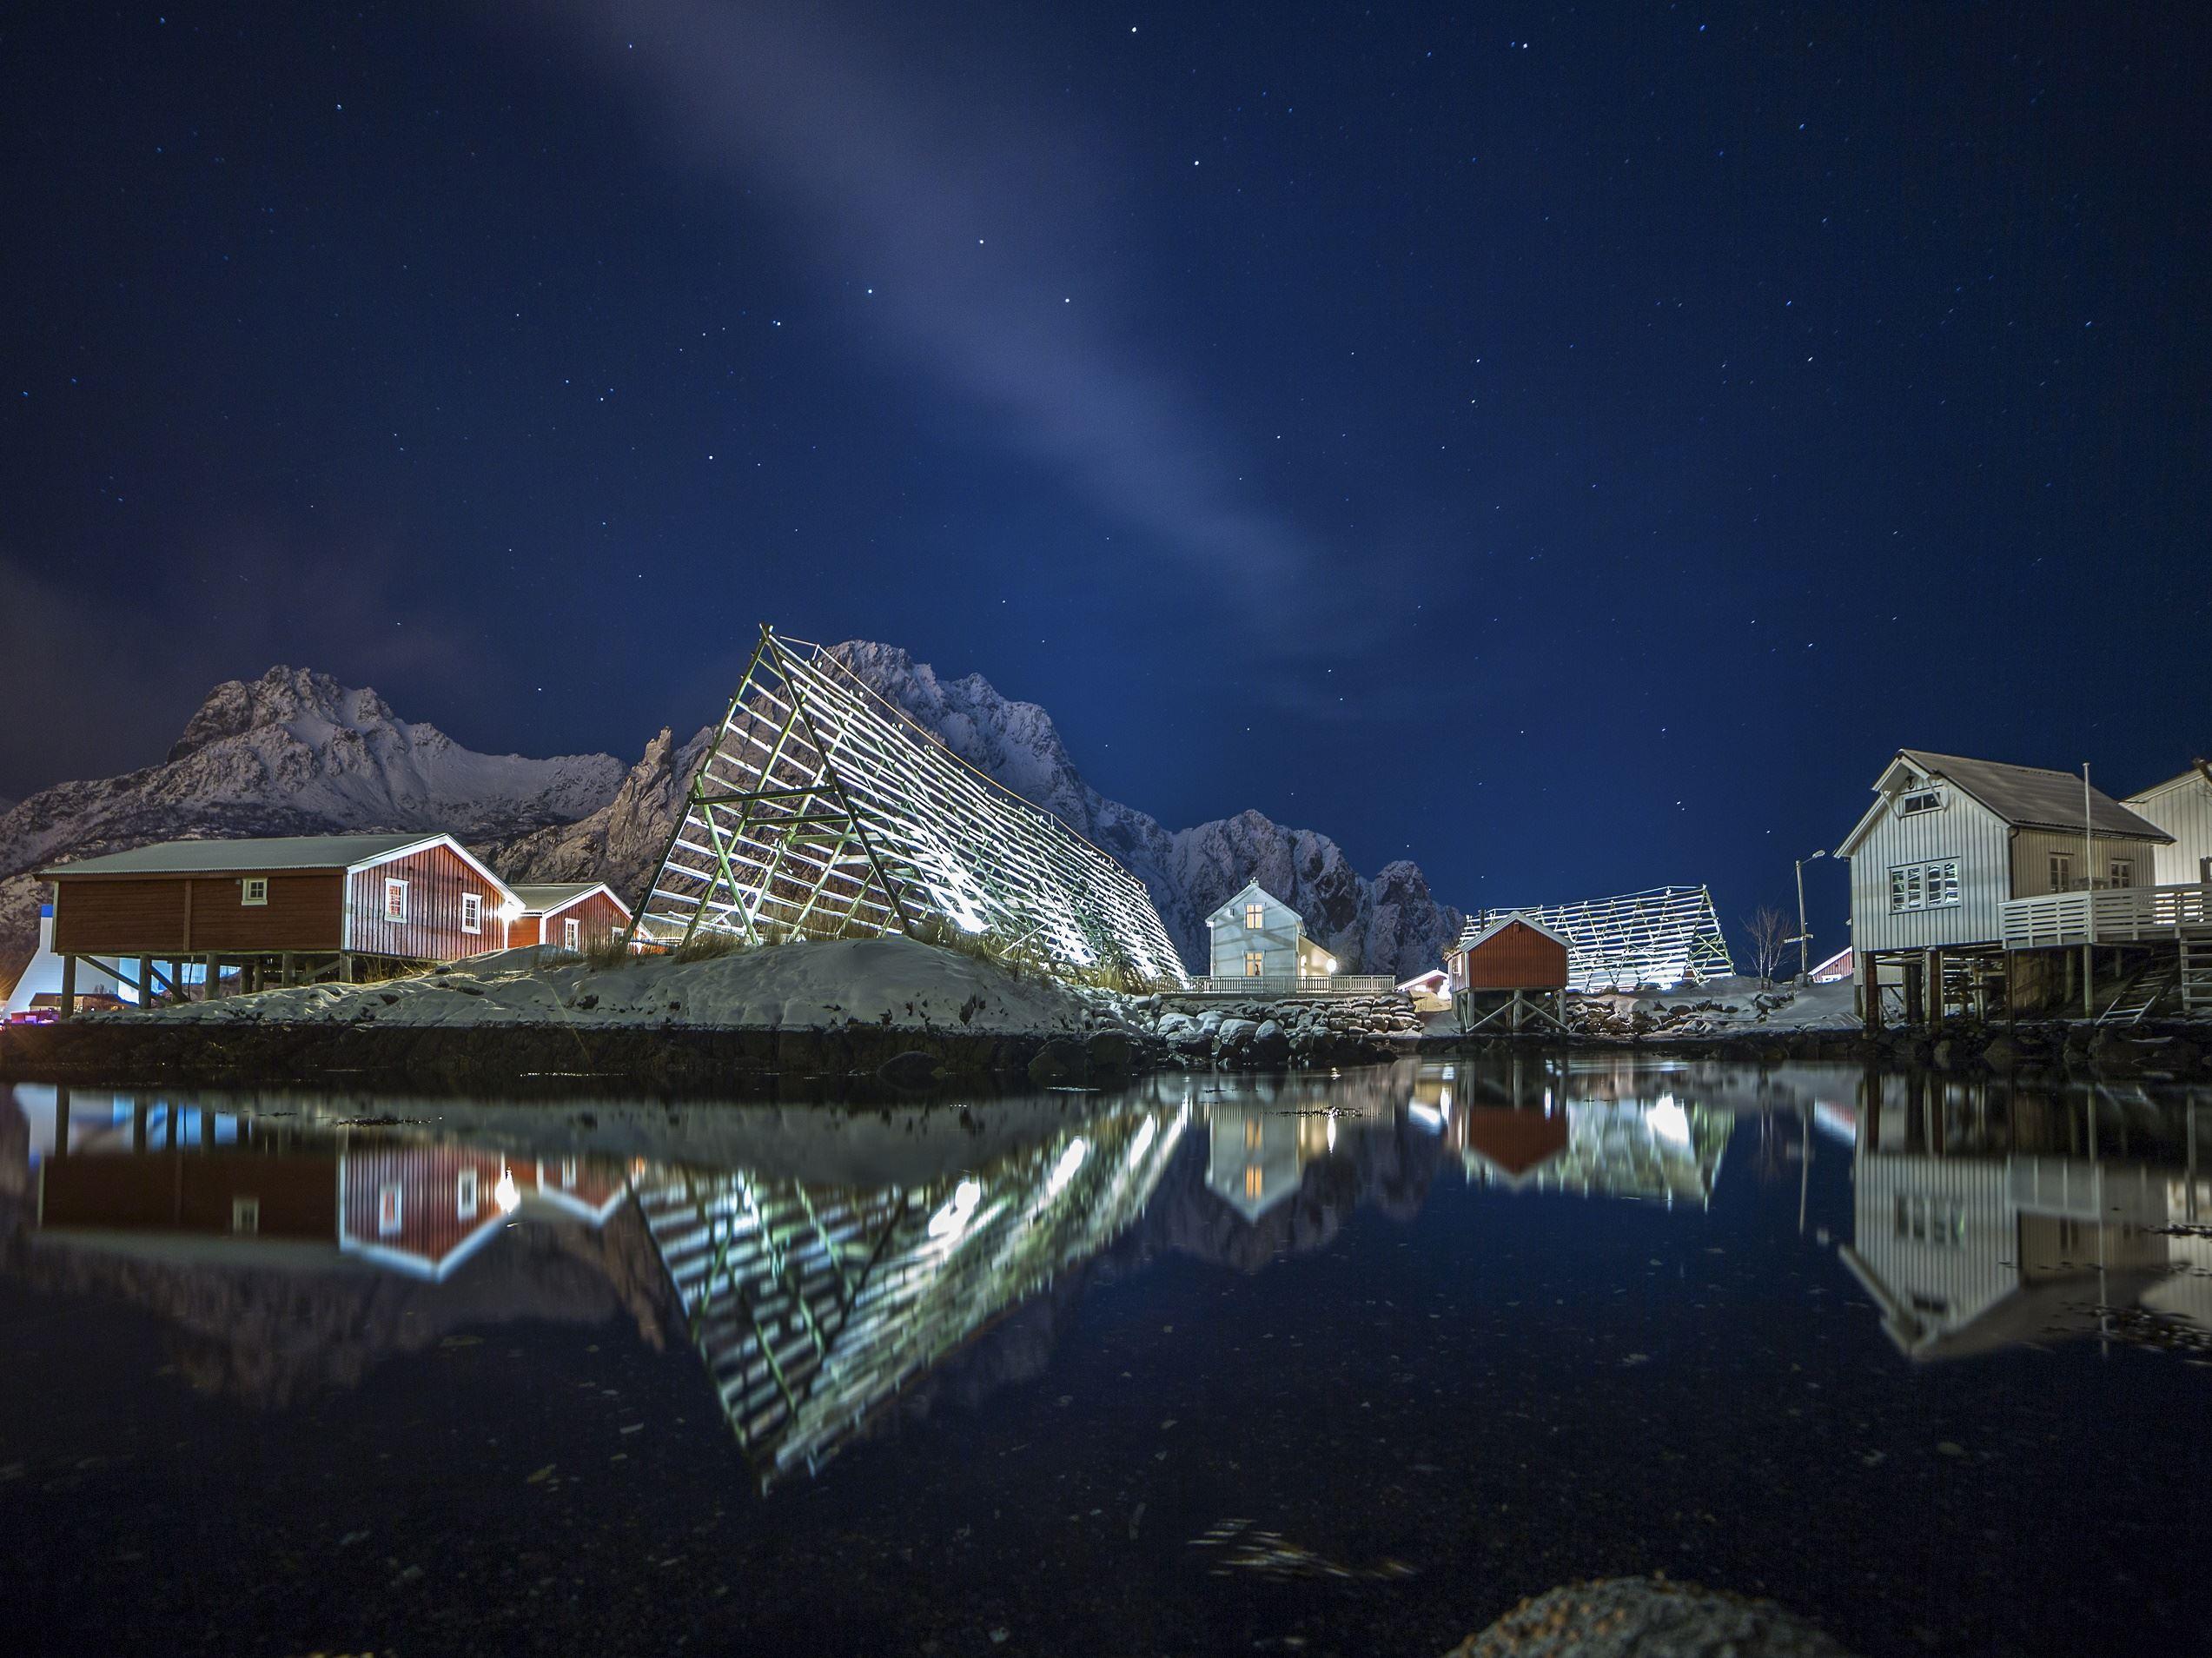 © Tommy Simonsen, Svinøya Rorbuer winter night